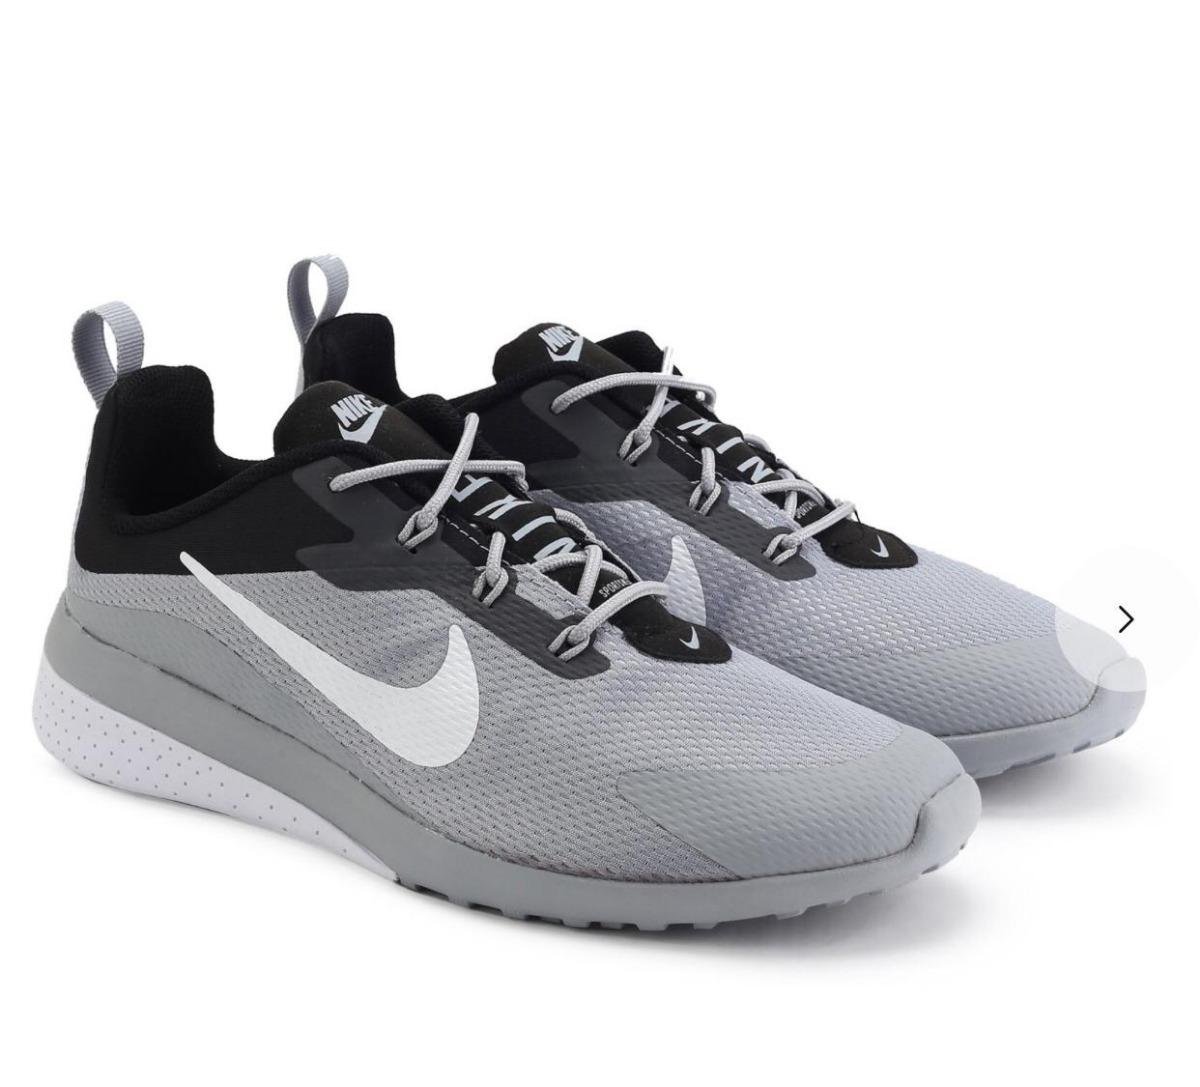 Tenis Nike Ck Racer 2 #26.5 Envio Gratis